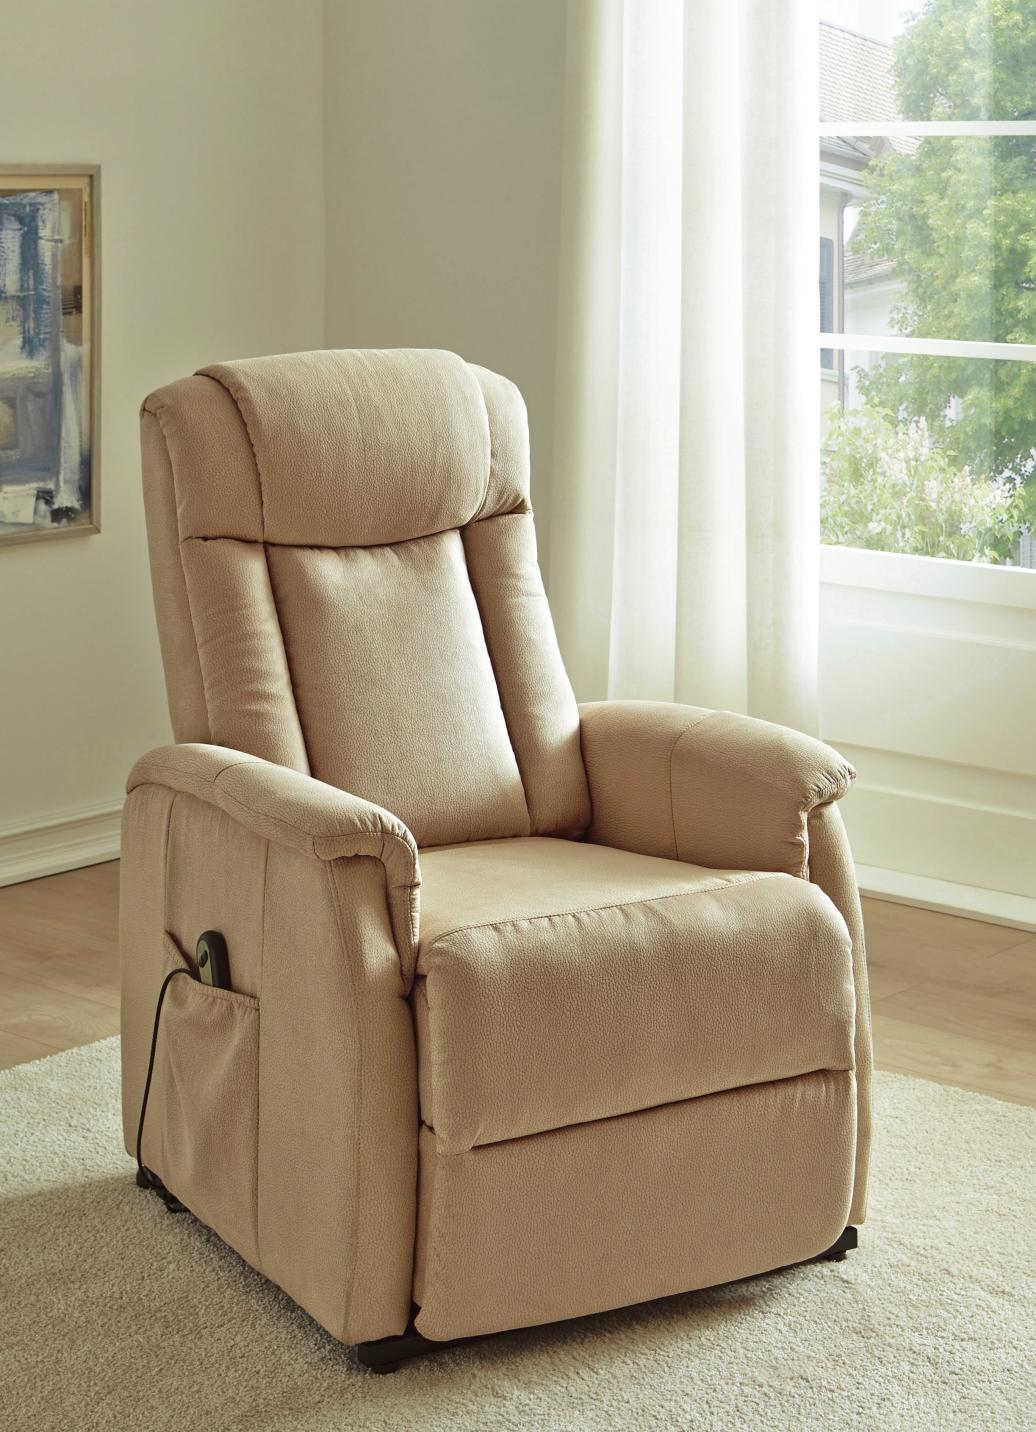 relaxsessel modern mit motor. Black Bedroom Furniture Sets. Home Design Ideas